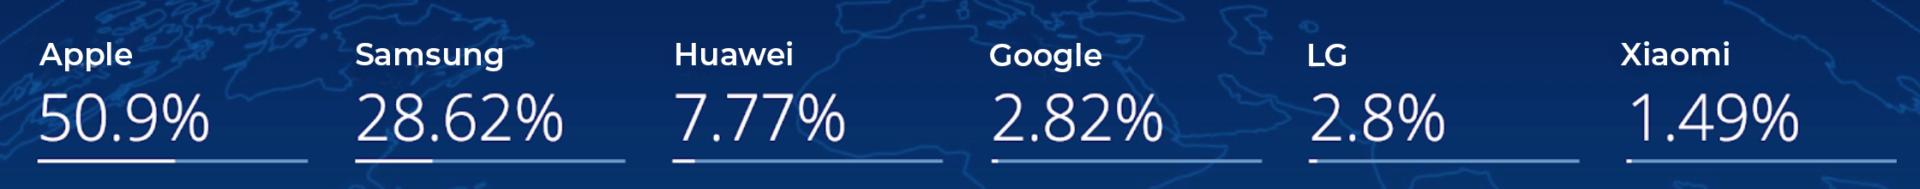 Apple 50.9% Samsung 28.62% Huawei 7.77% Google 2.82% 2.8% Xiaomi 1.49%